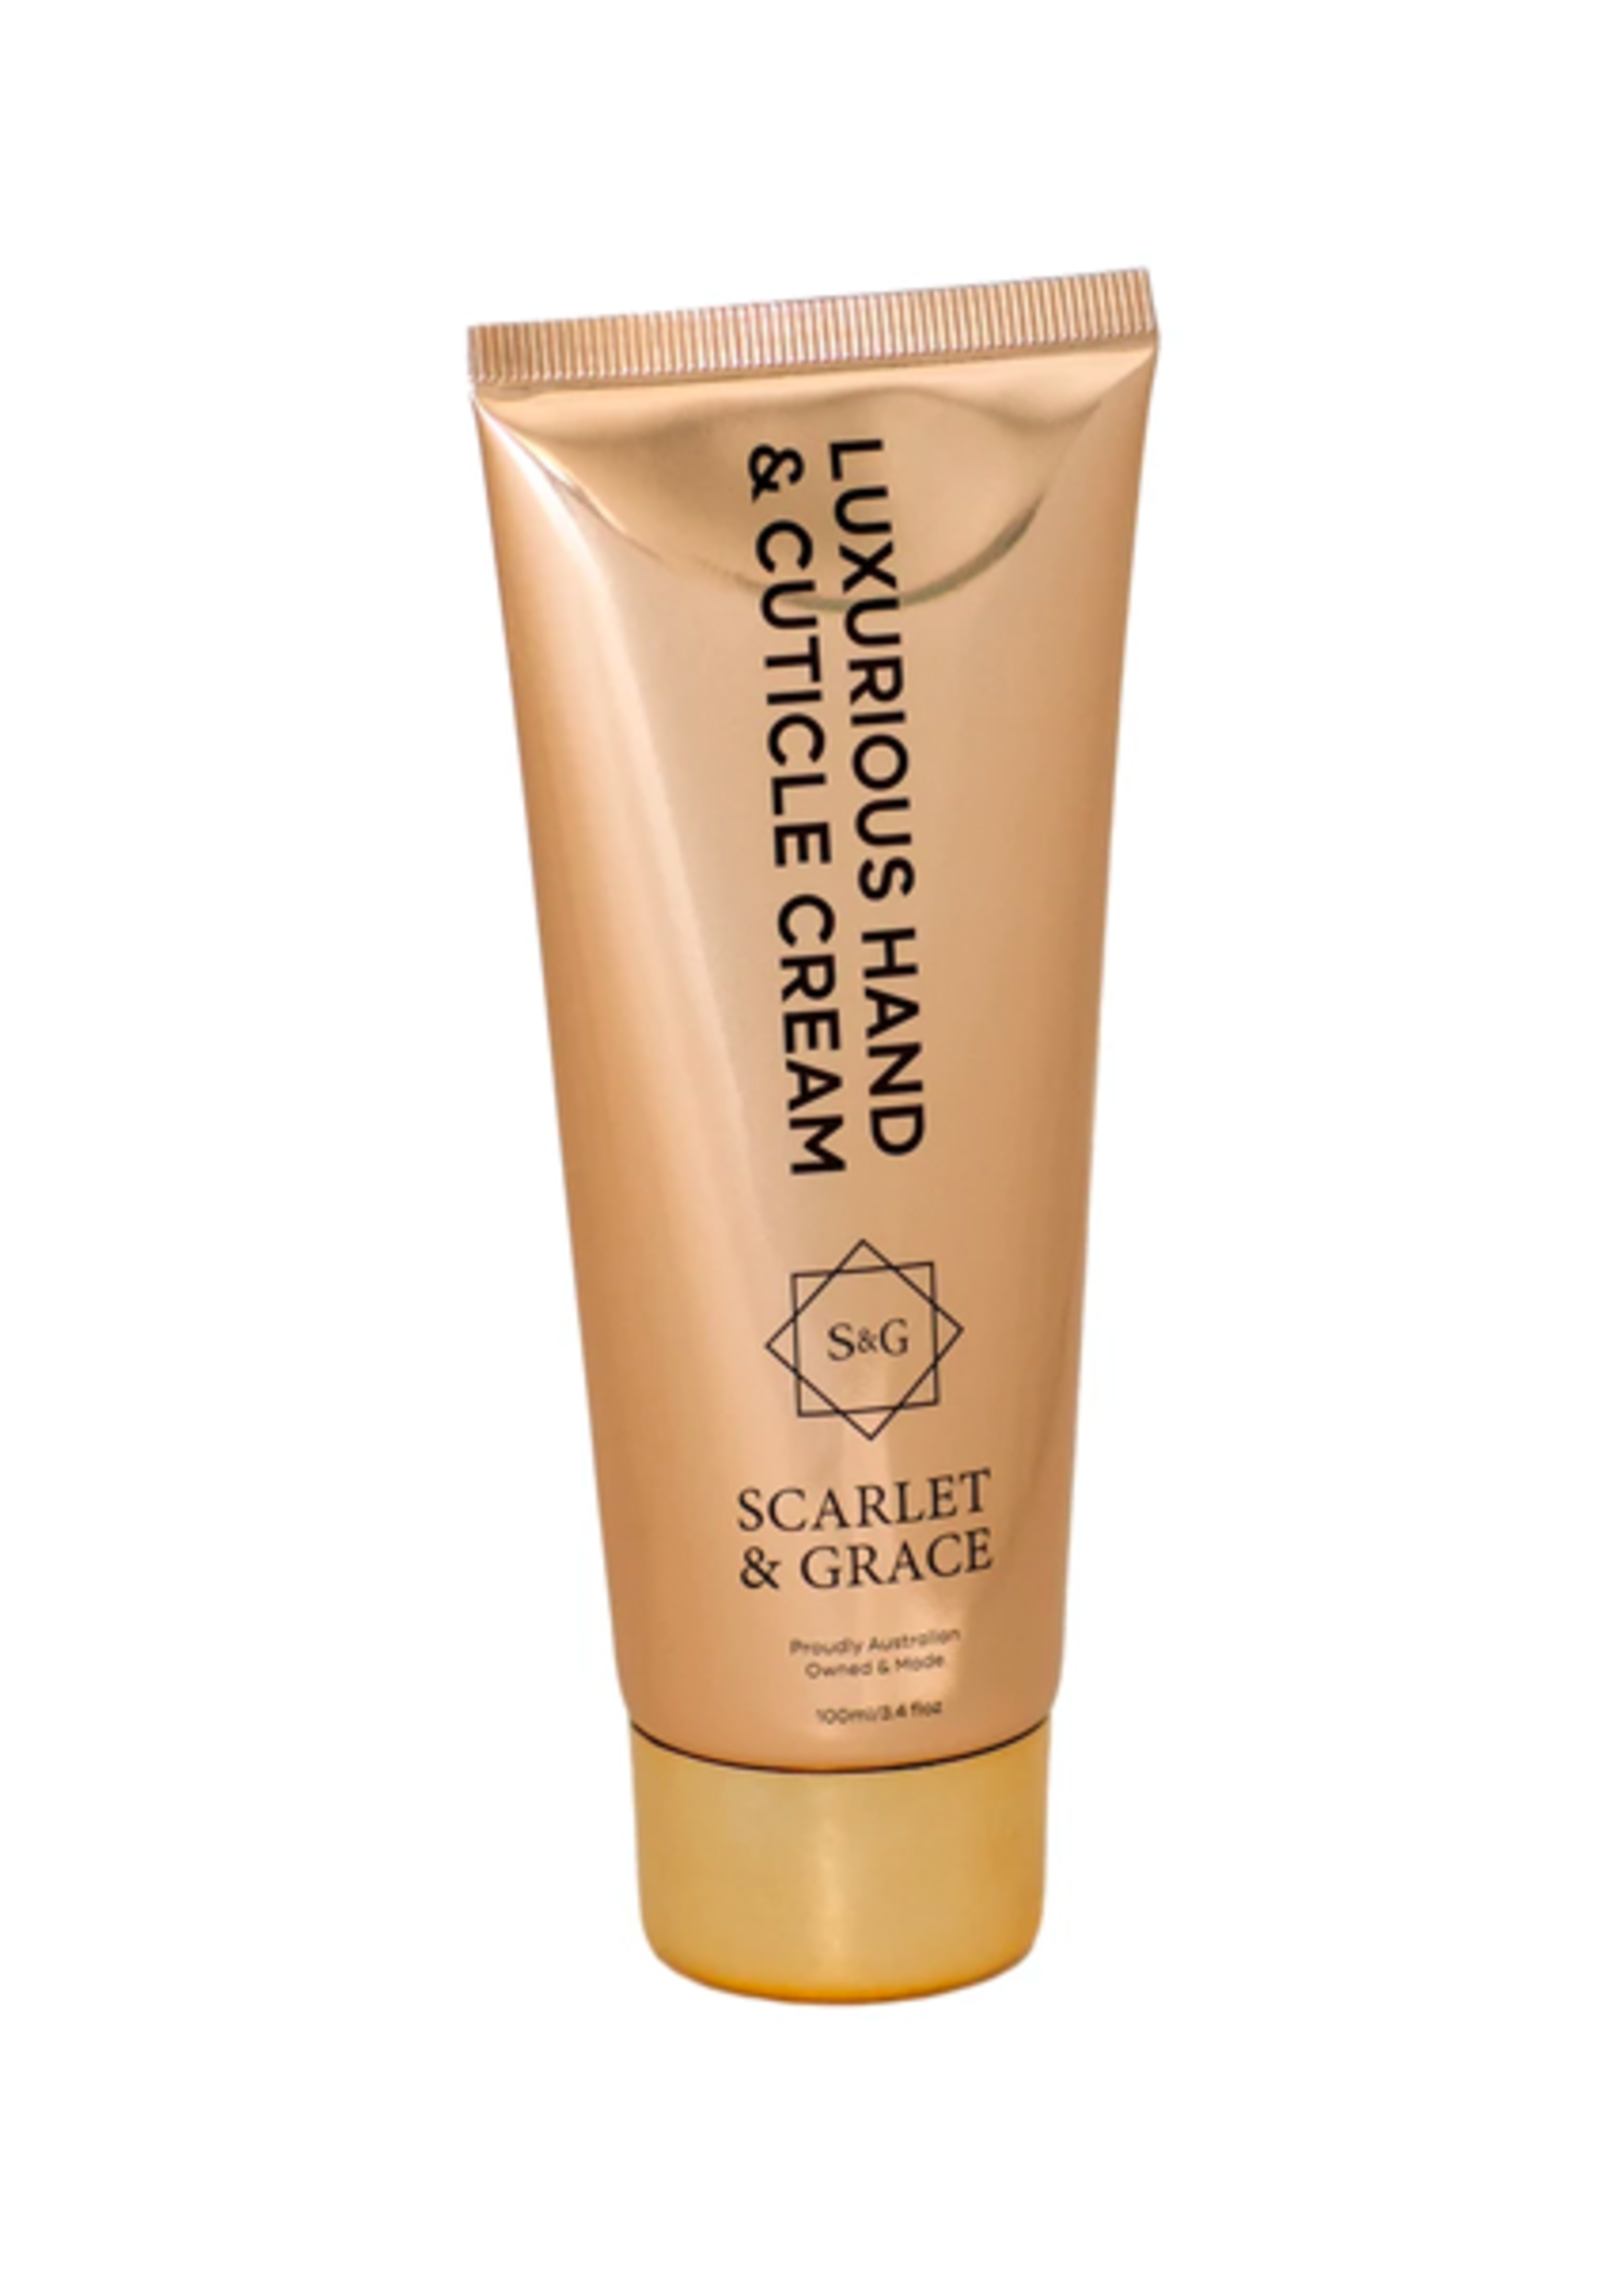 Scarlet & Grace 100ml Hand Cream - Vanilla, Patchouli & Sandalwood